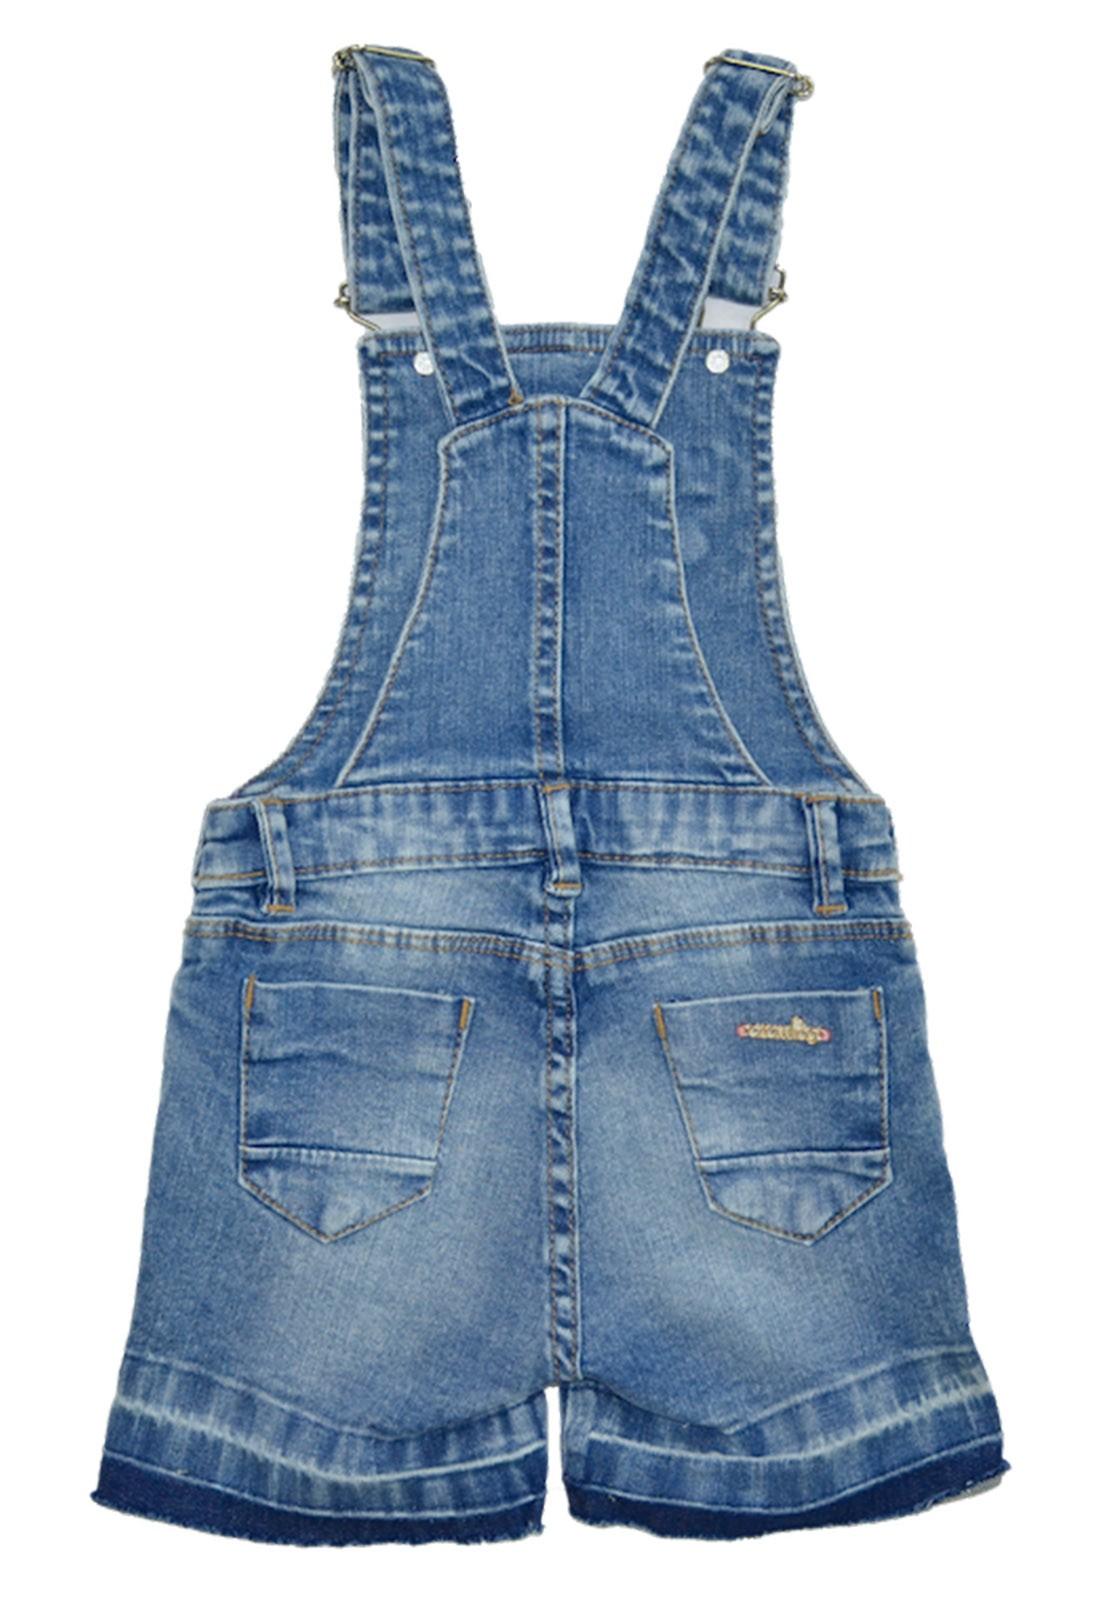 Jardineira Crawling Jeans Feminina